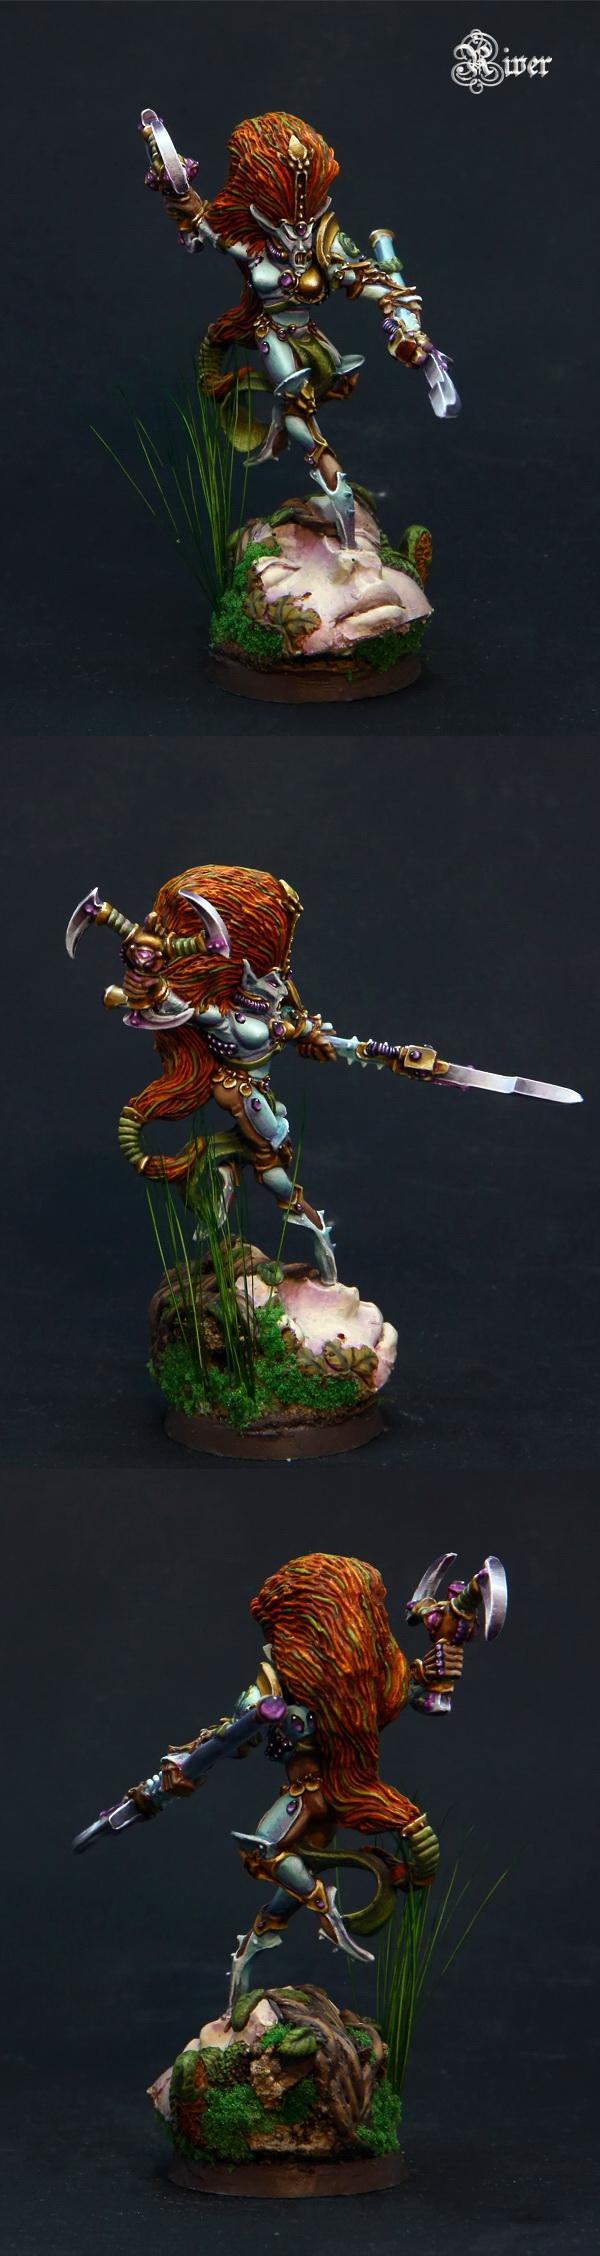 Jain Zar, the Phoenix lord